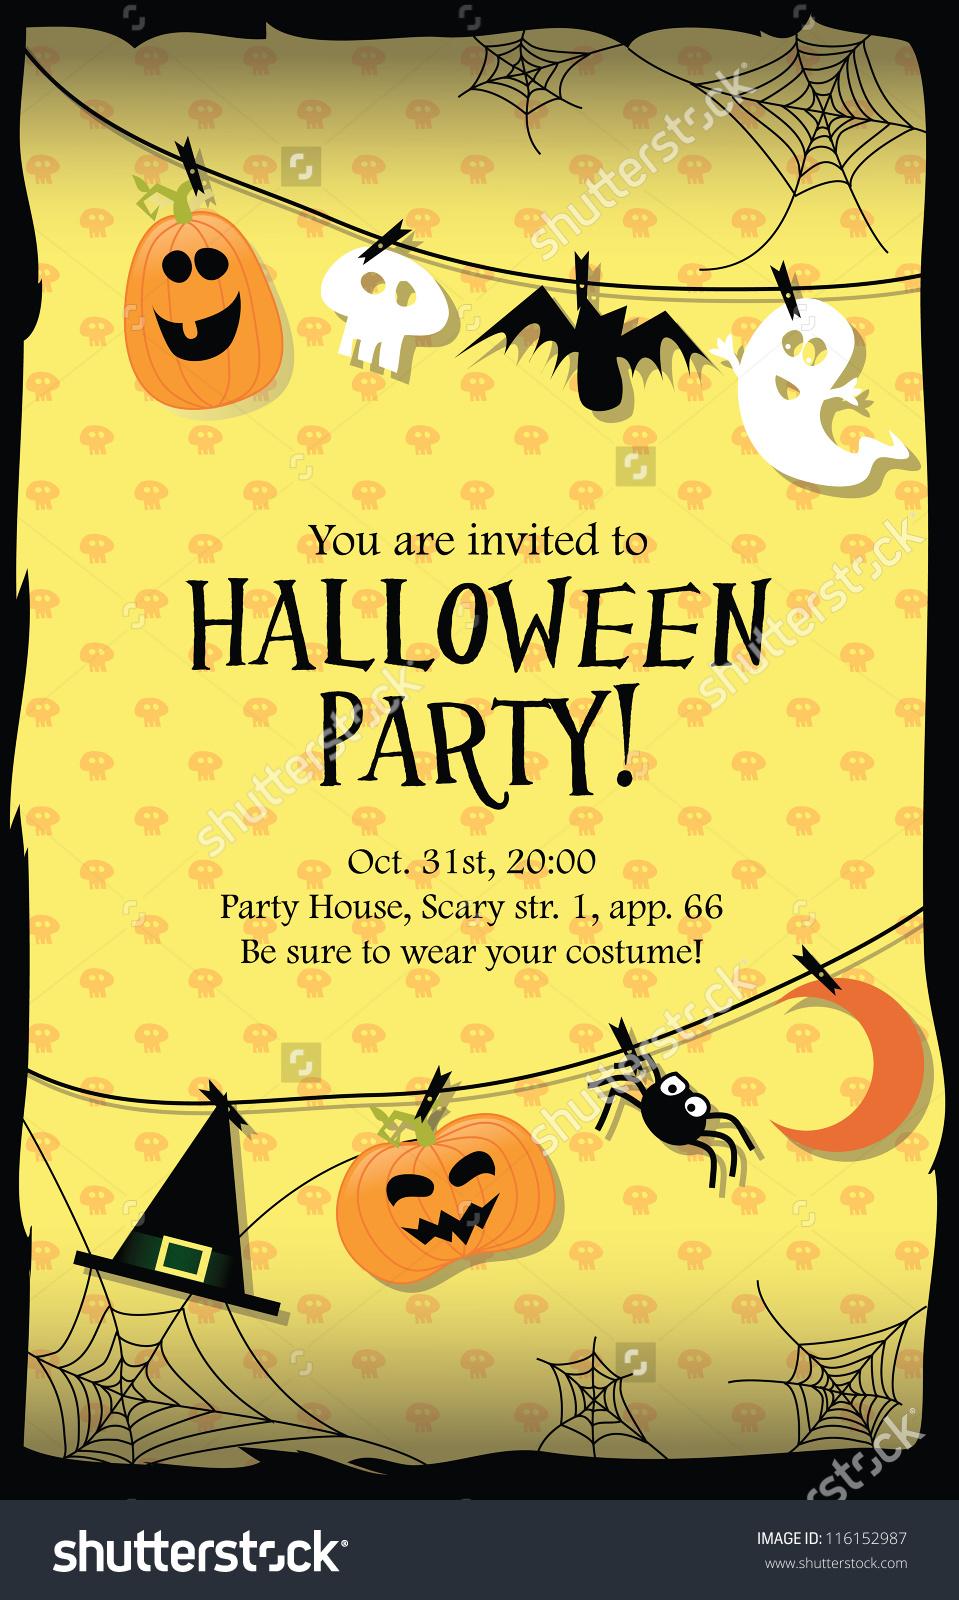 43+ Halloween Party Invitation Clipart.